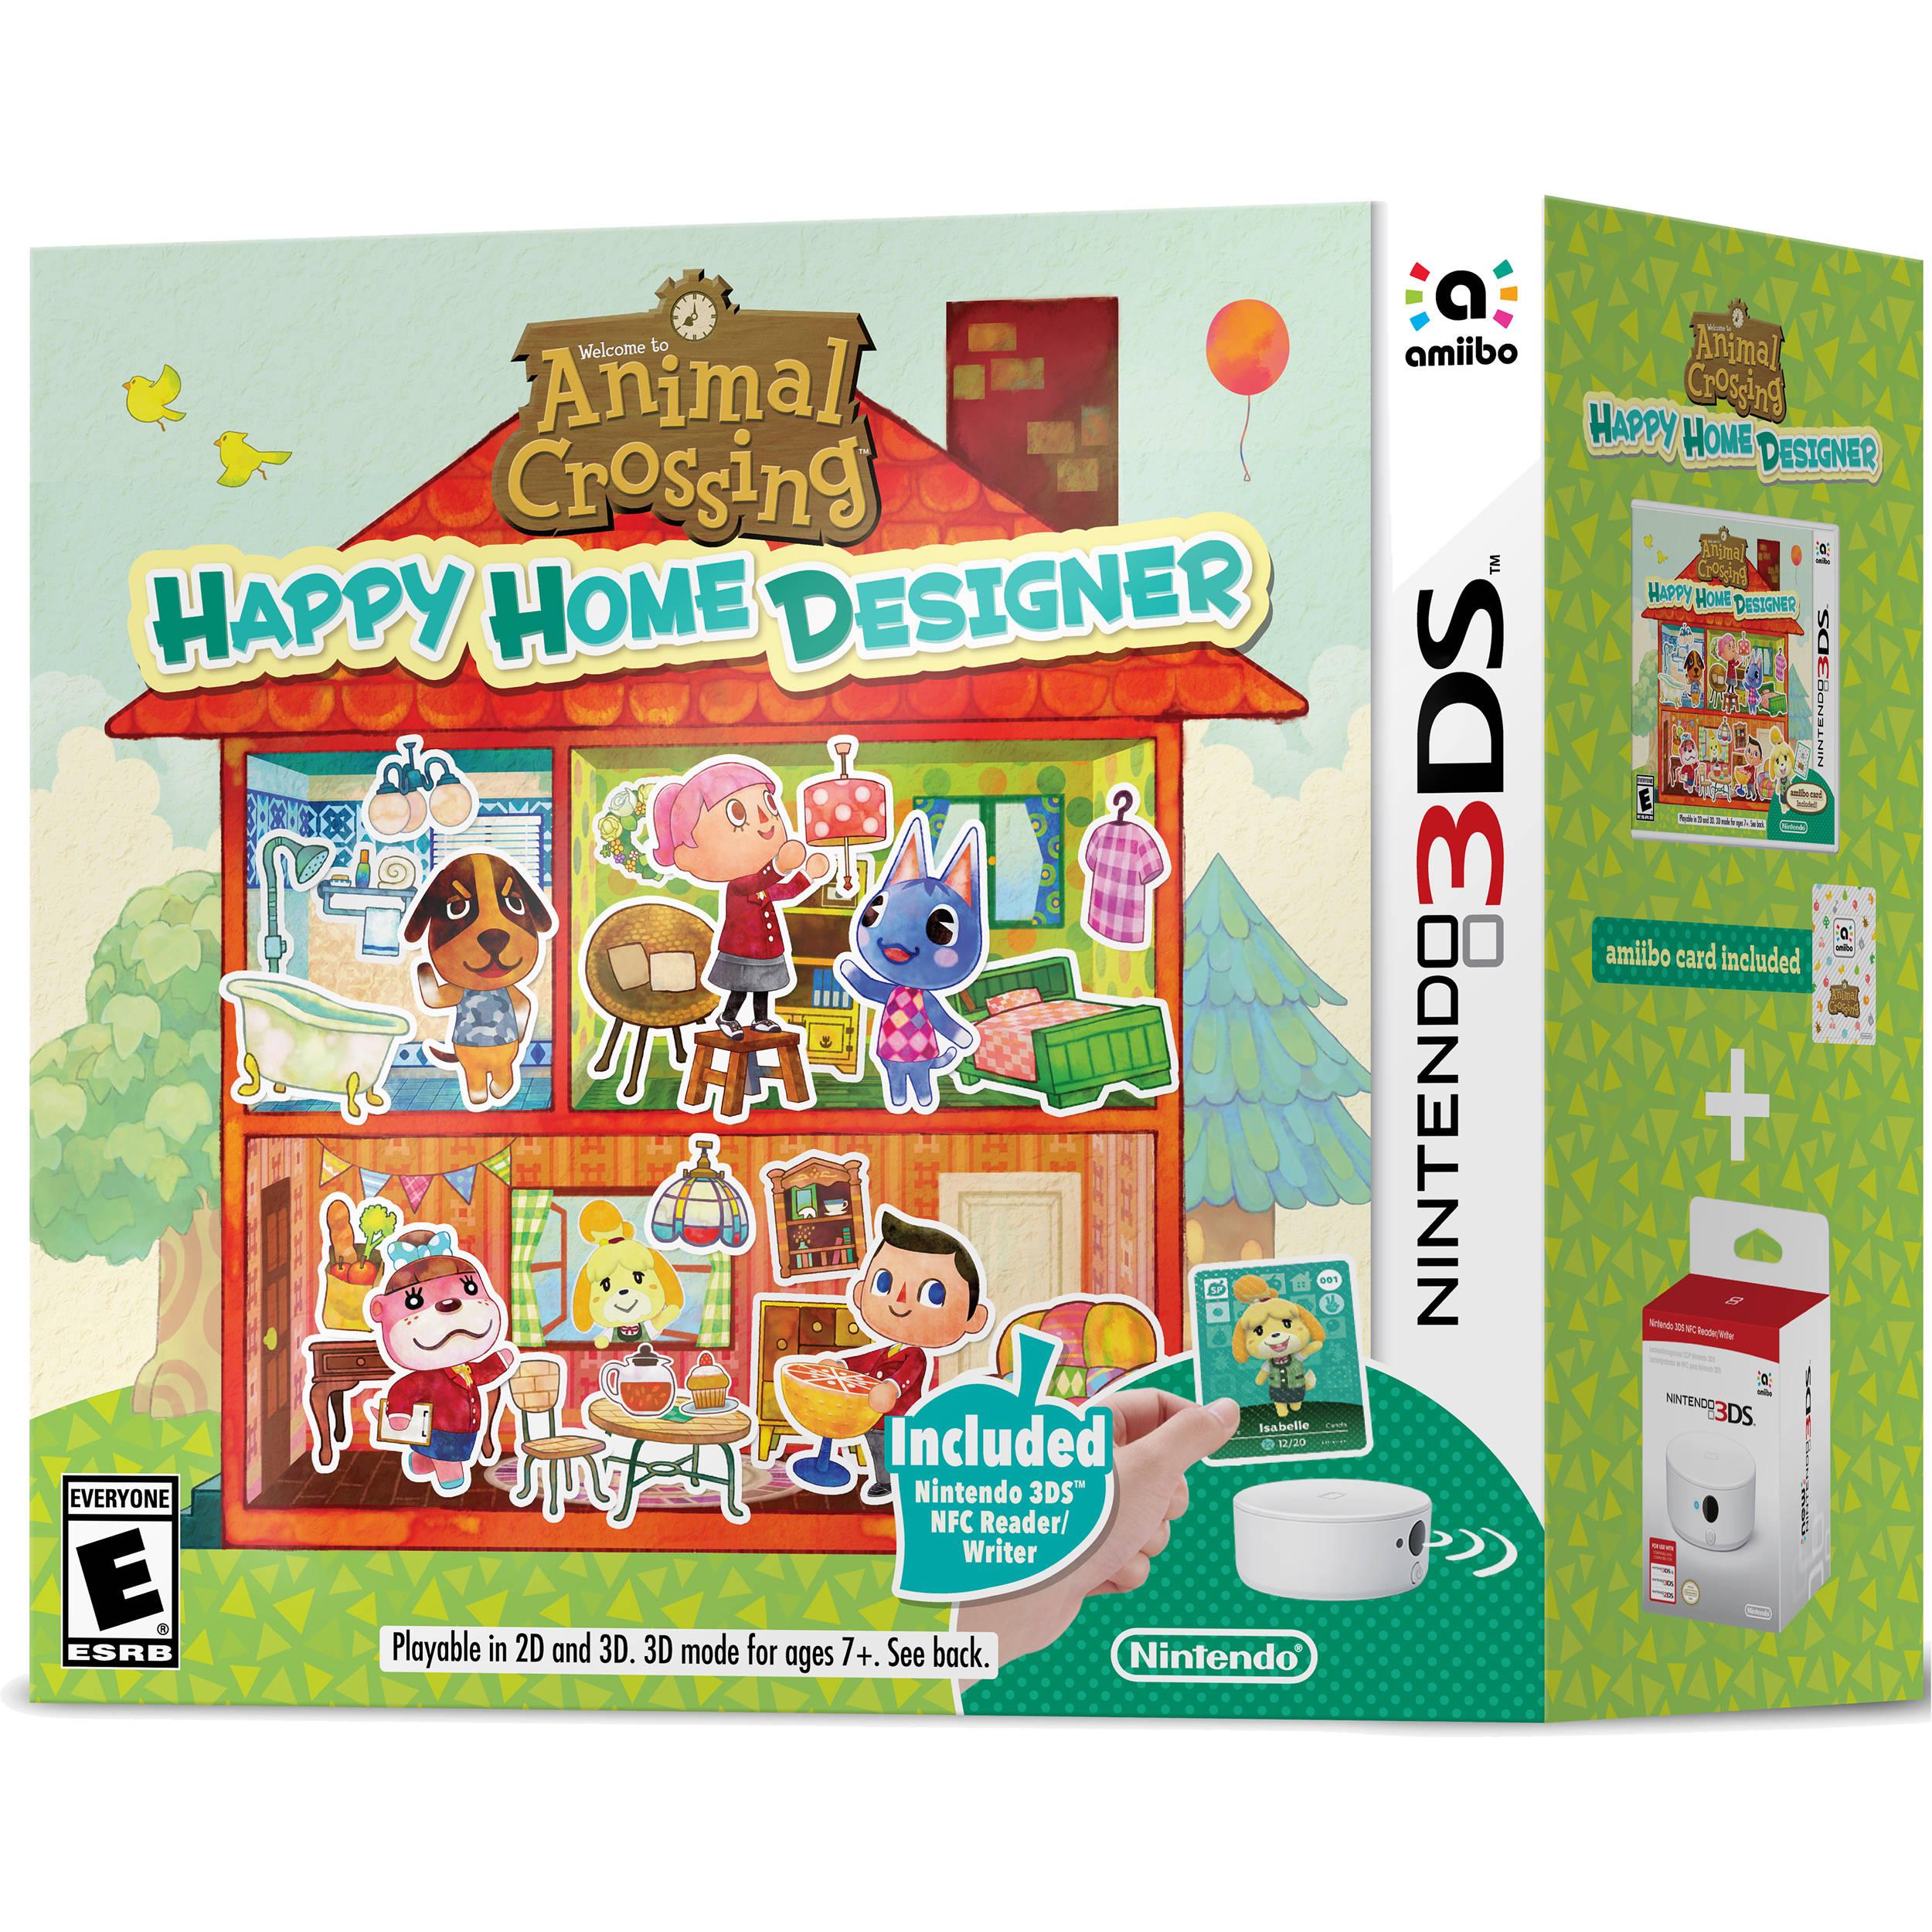 Nintendo Animal Crossing: Happy Home Designer with NFC Reader/Writer  (Nintendo 3DS)